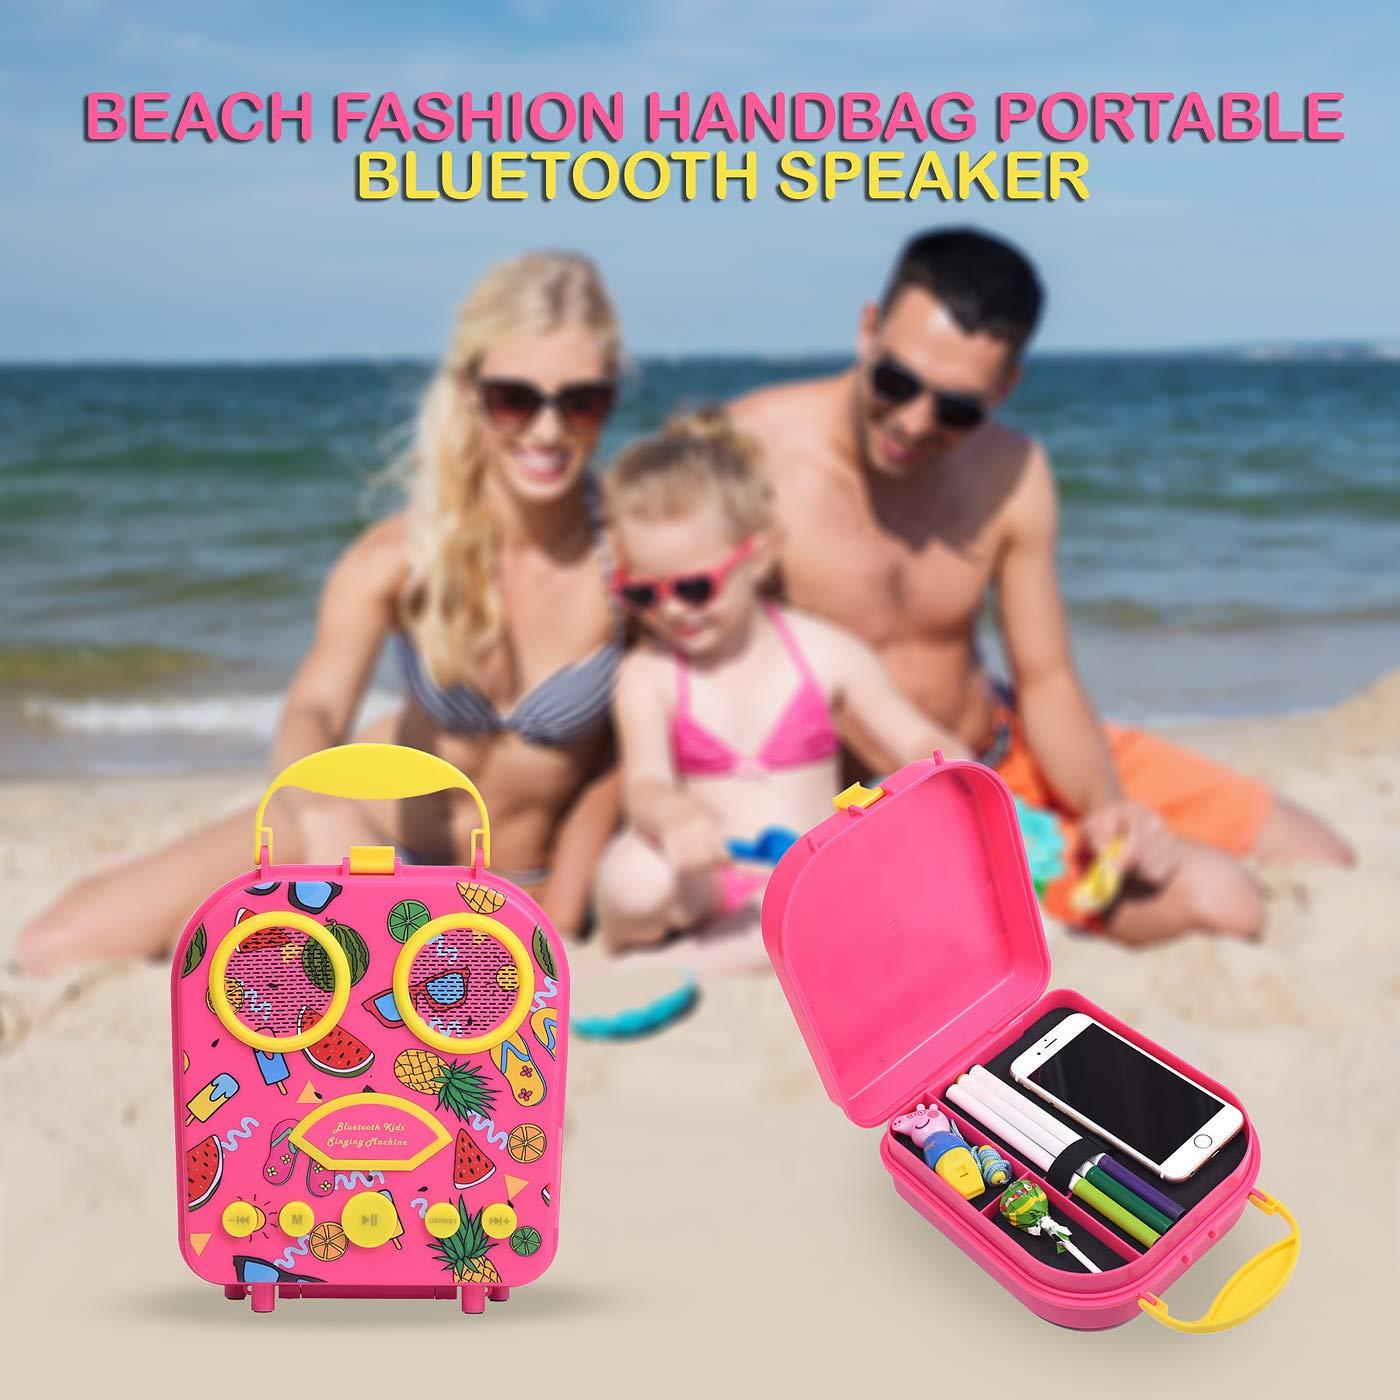 Bluetooth Speaker Children's Karaoke Speaker Portable Microphone Beach Handbag Karaoke Bluetooth Speaker Wireless Cartoon Speaker for Kids for Indoor Outdoor Travel Activities with Microphone (Pink) by HowQ (Image #8)